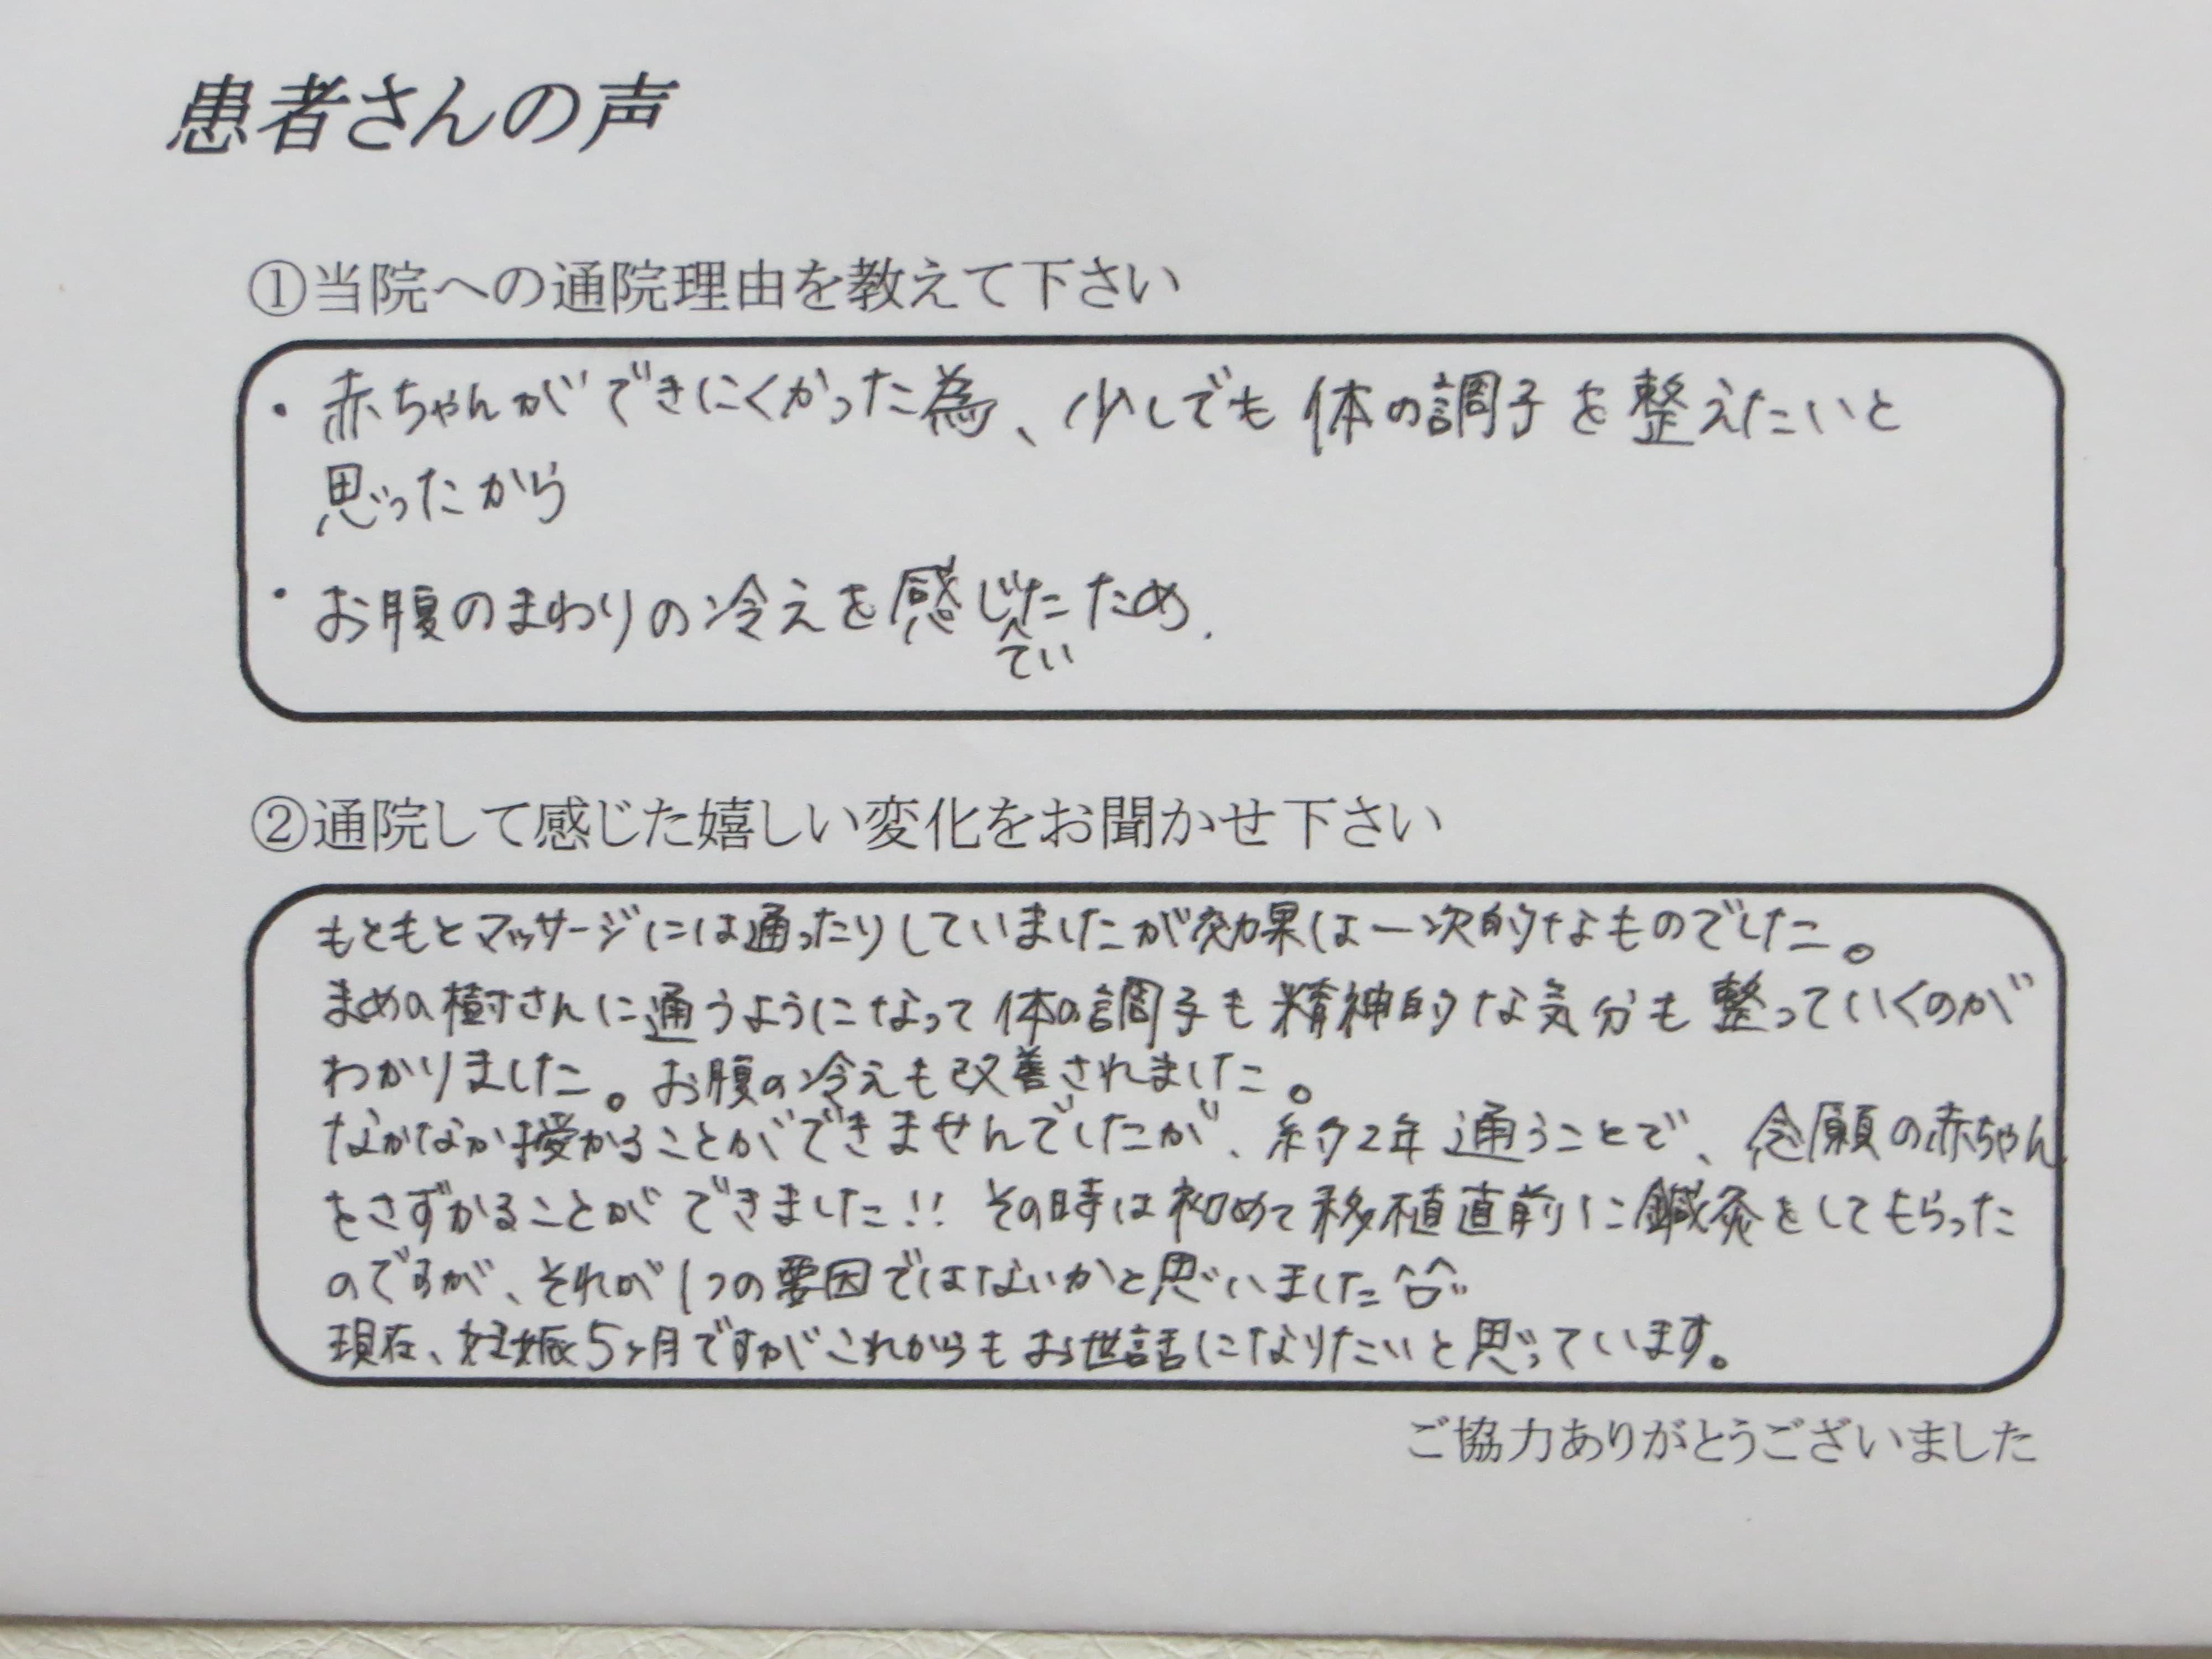 IMG_1890.JPG 田中 声